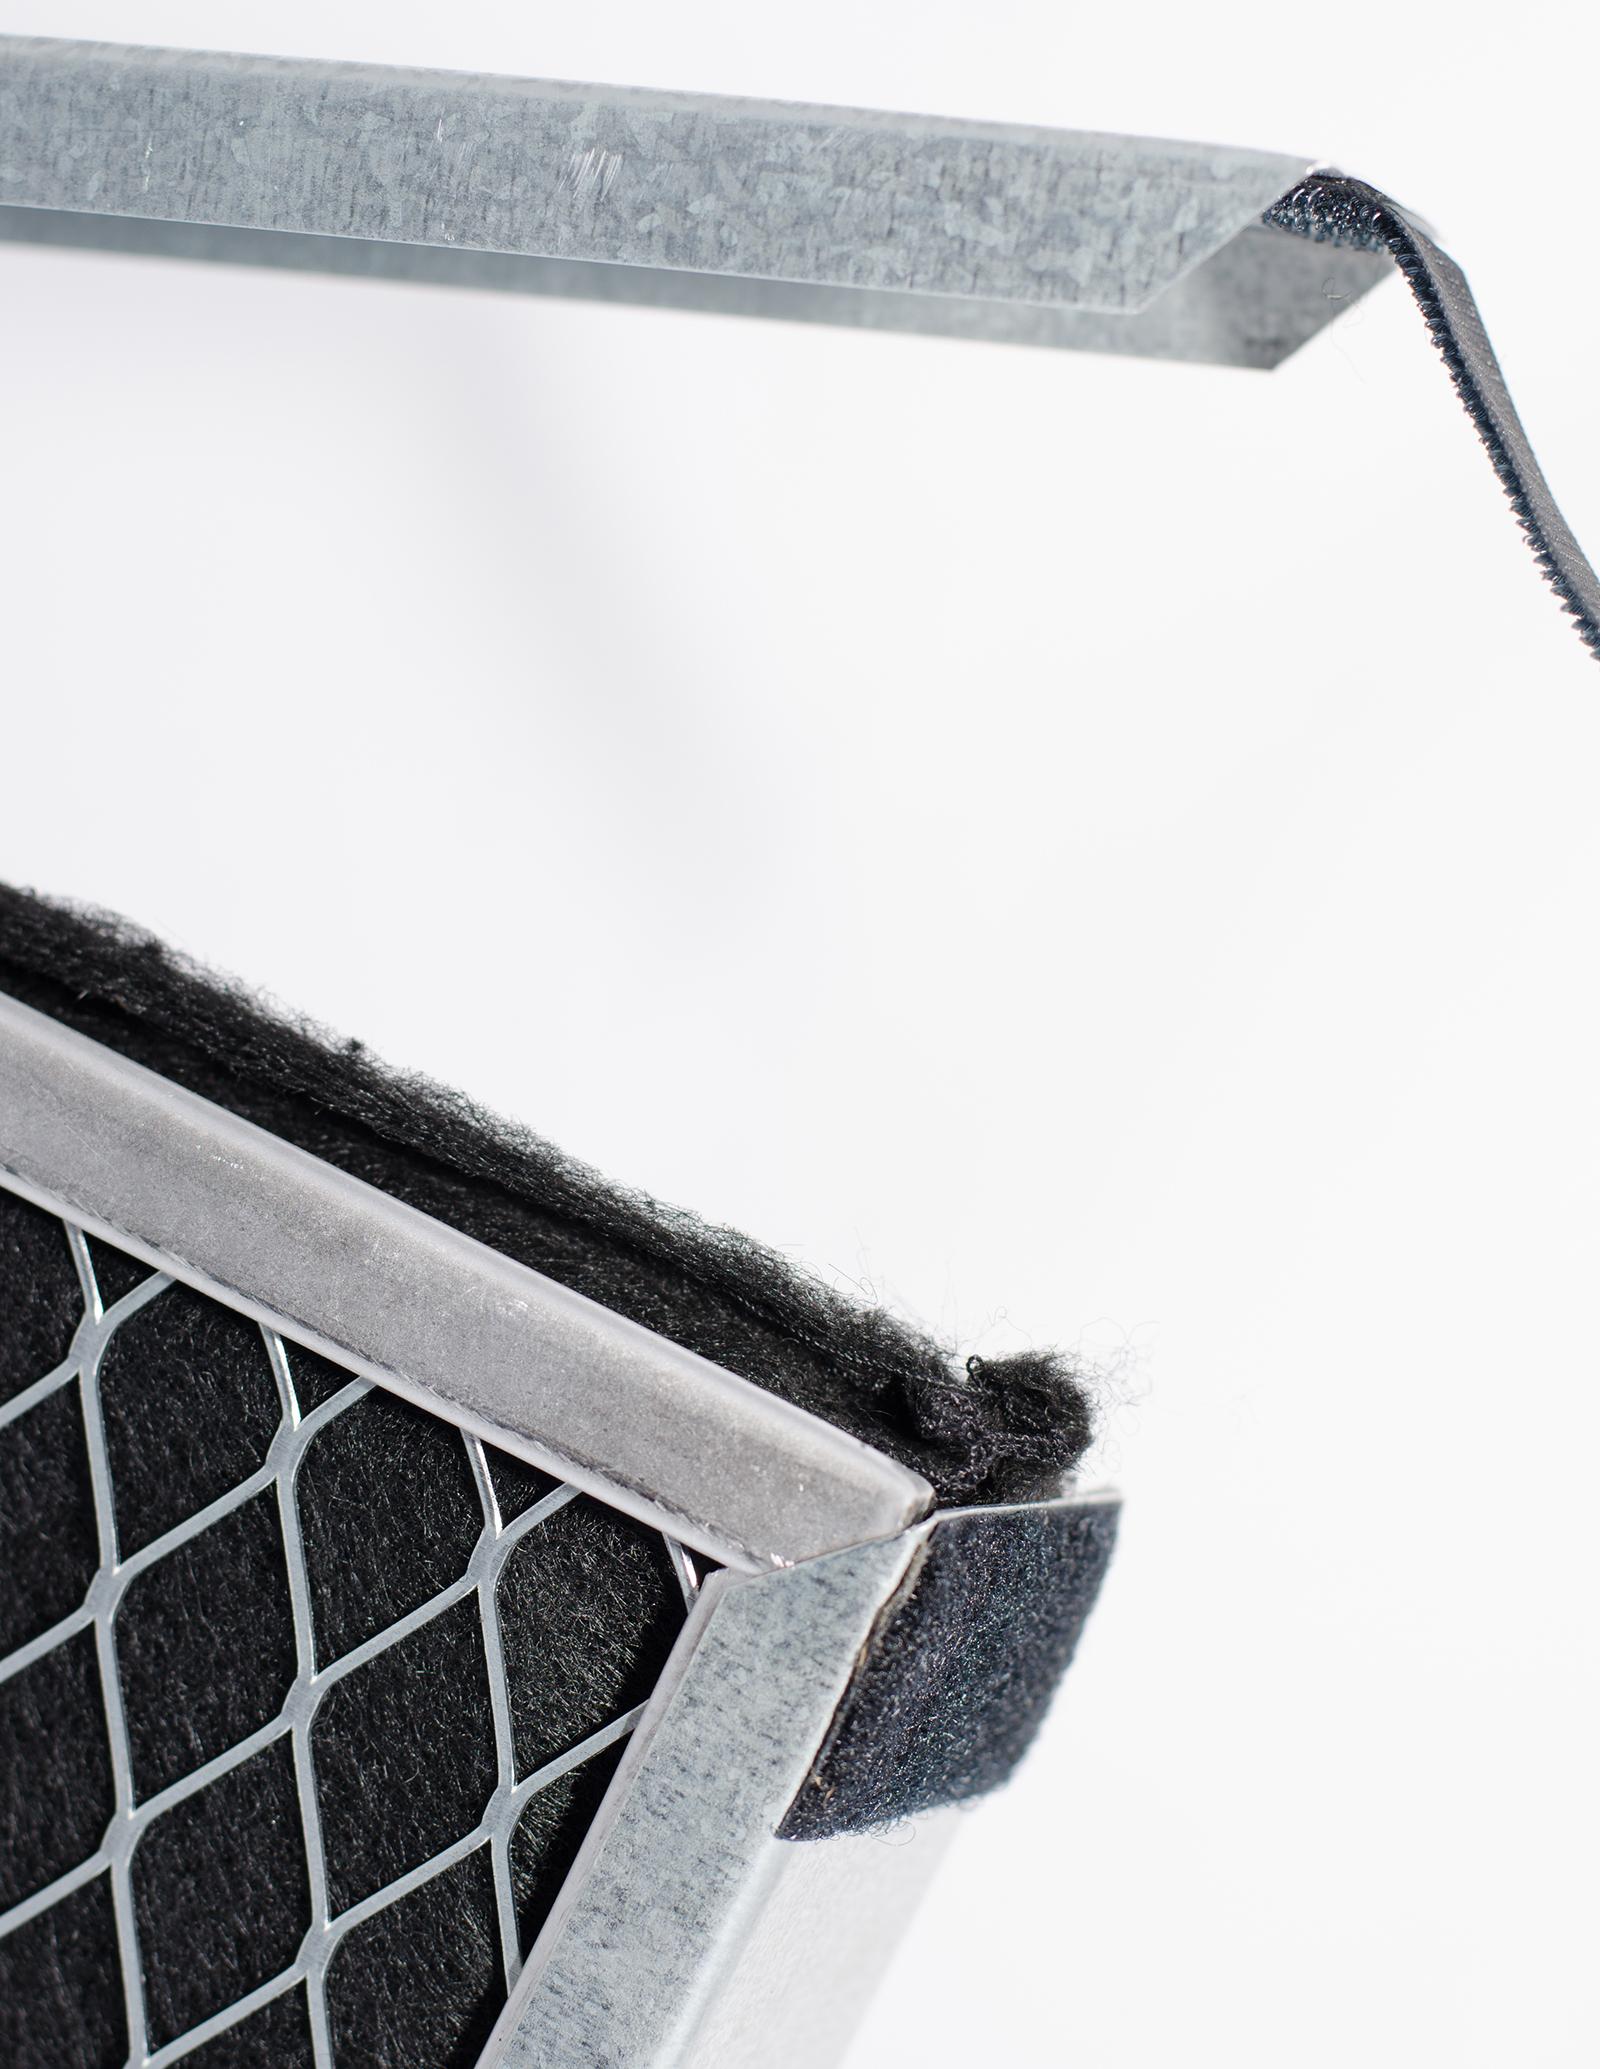 DustPlus Air Filter